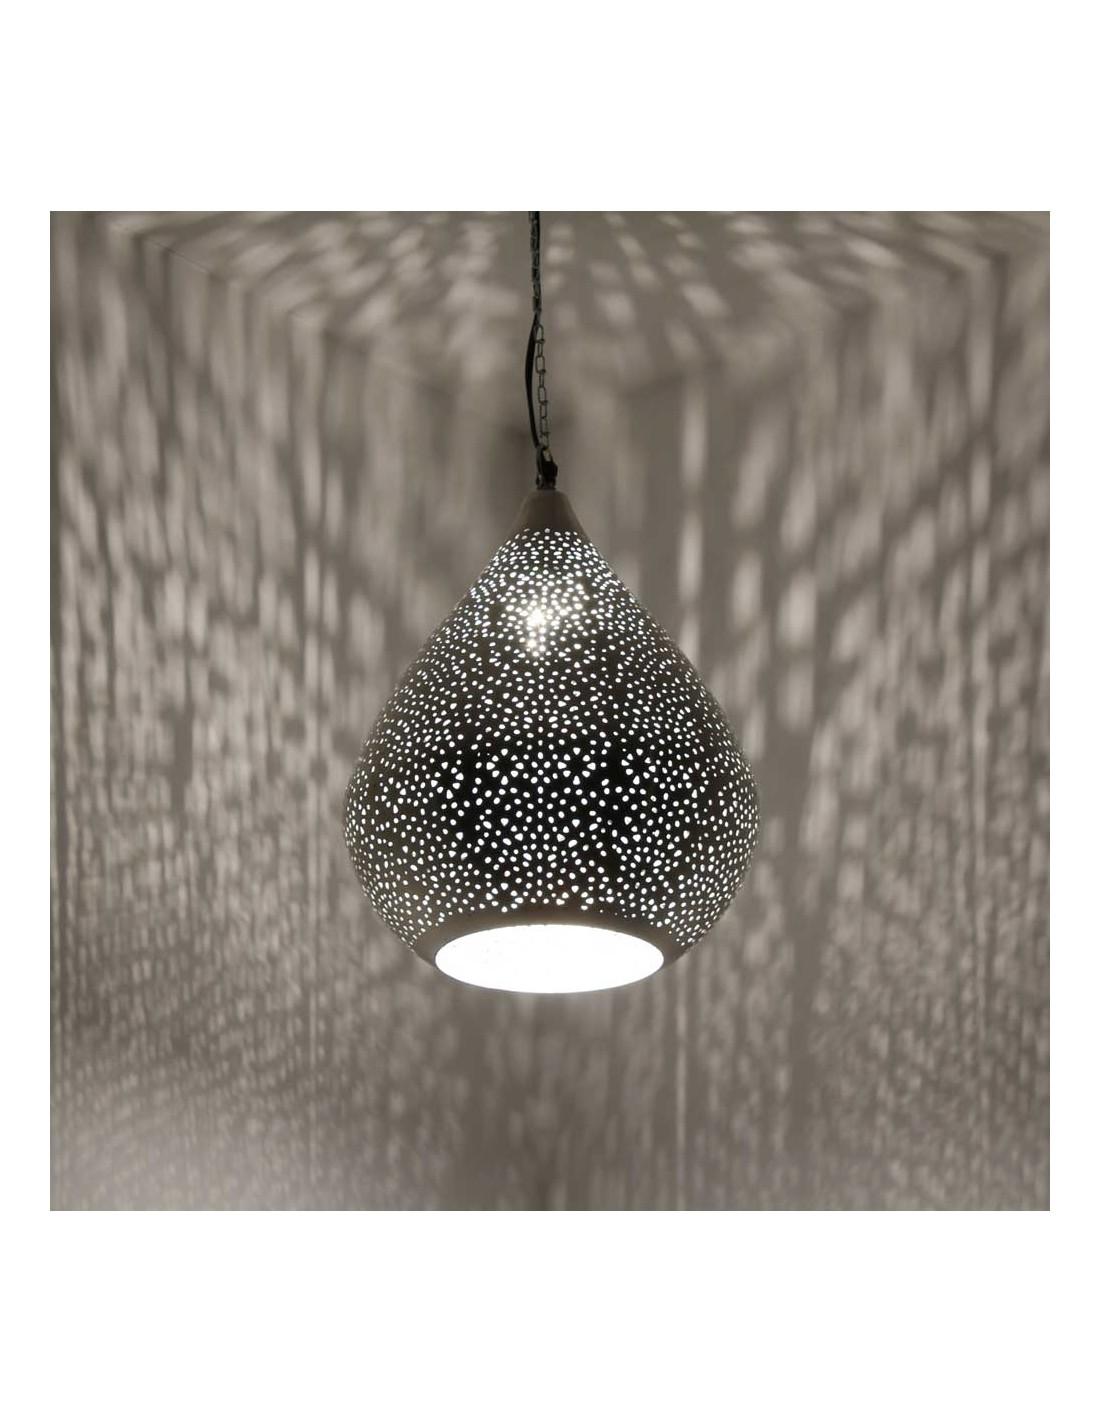 orientalische tischlampe dipa 34cm in silber albena shop. Black Bedroom Furniture Sets. Home Design Ideas